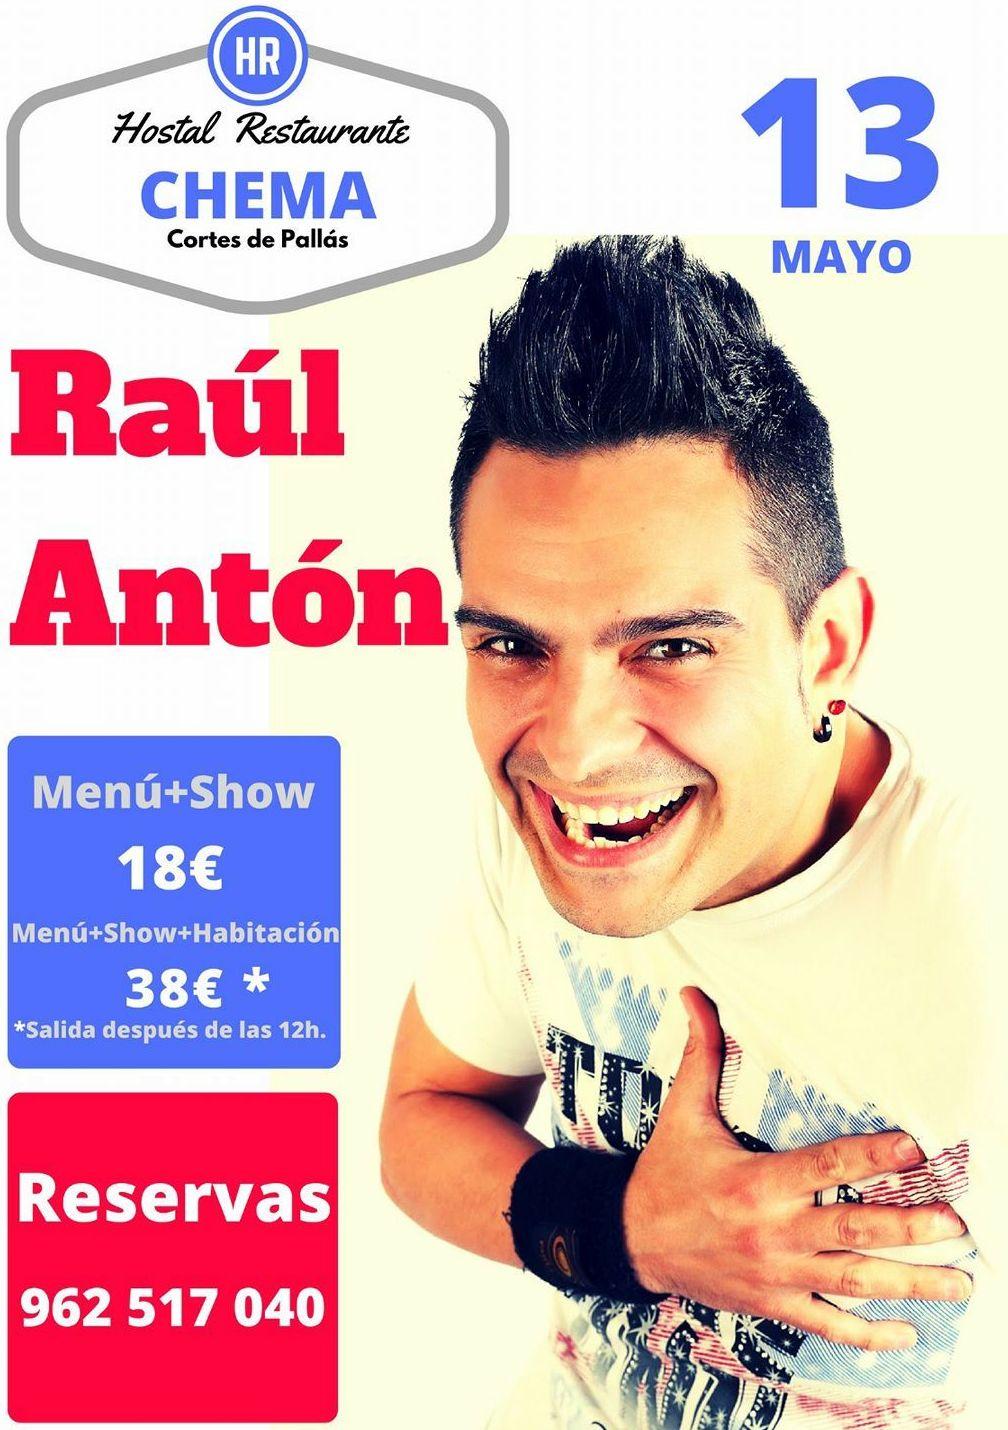 Raúl Antón vuelve a Hostal Restaurante Chema. Sábado 13 de mayo